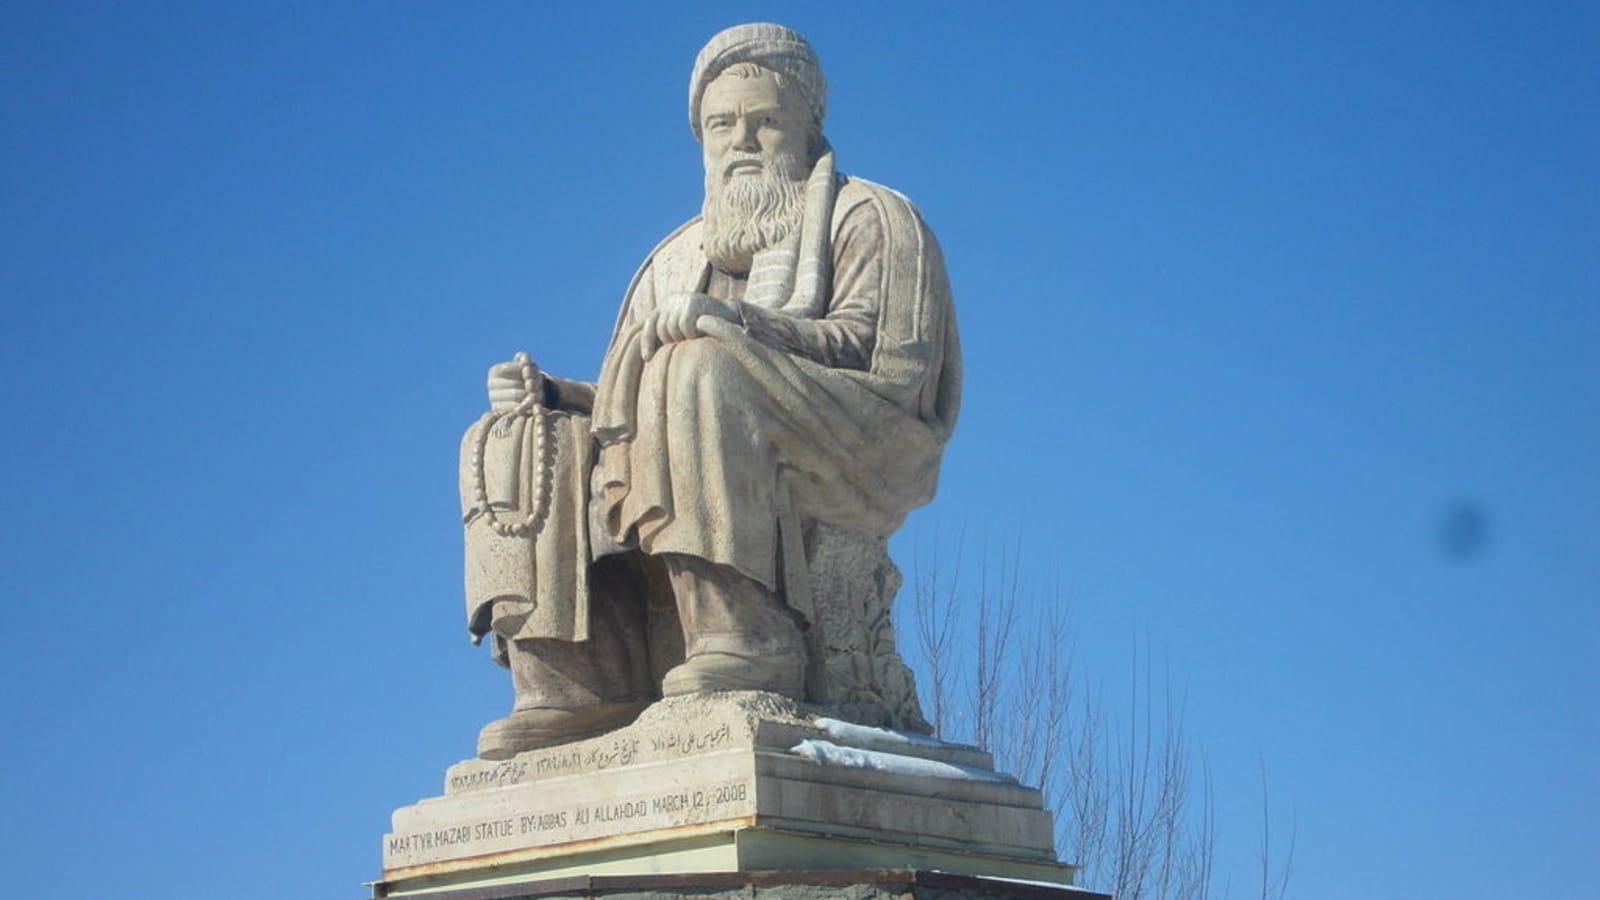 C:\Users\Nermeen.Saeed.ecss\Desktop\البحر الأحمر\1024px-Statue_of_Mazari_in_Bamyan_1629271300939_1629271306011.jpg